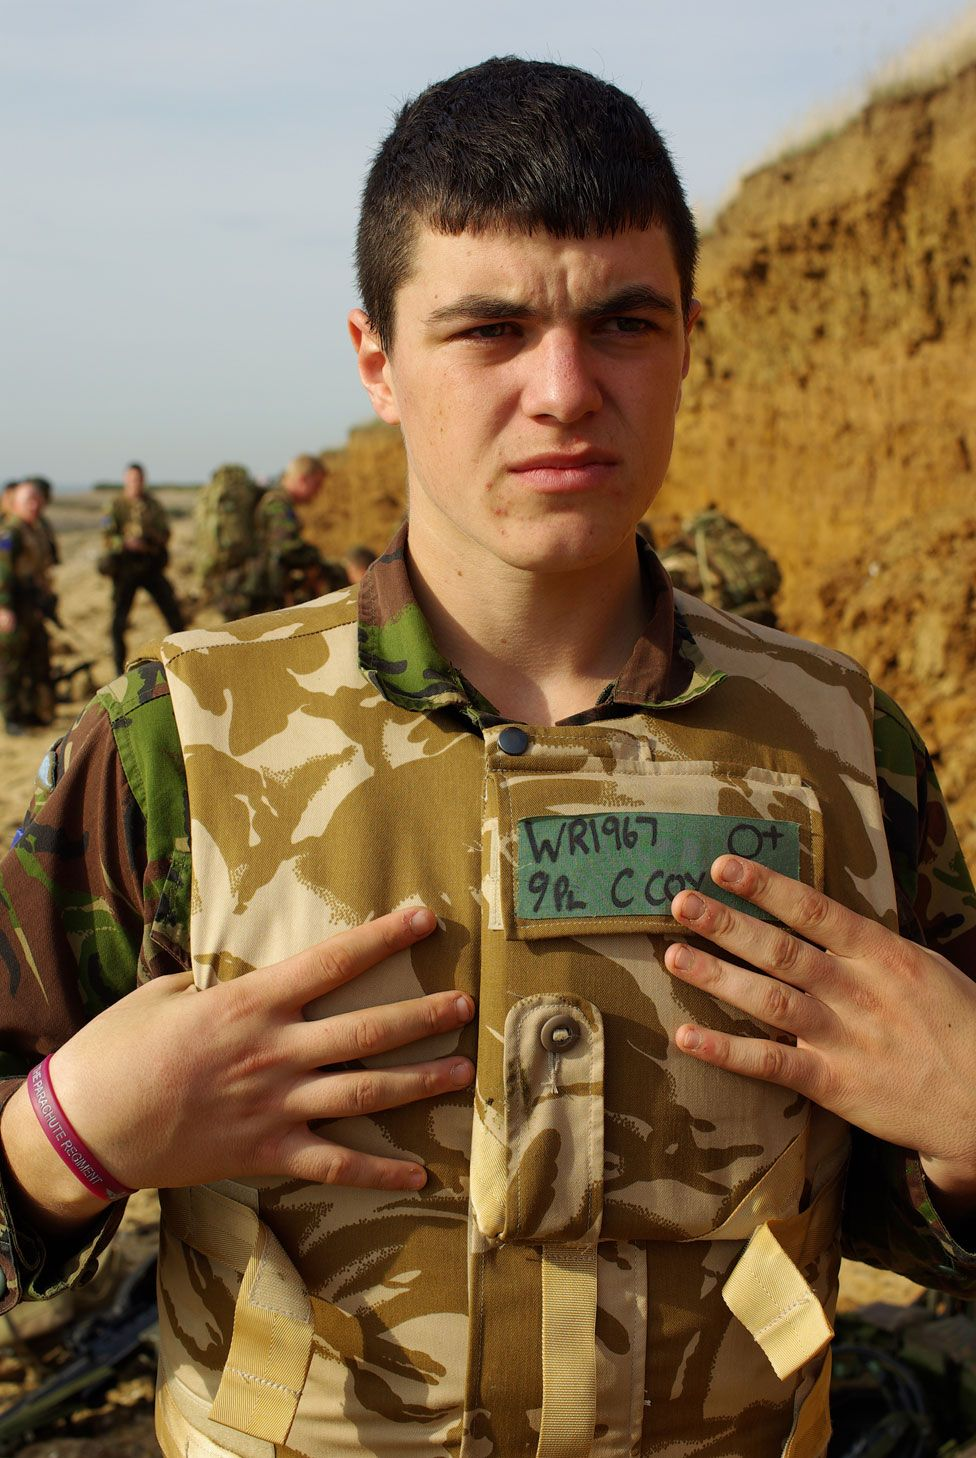 Callum Wright in the army